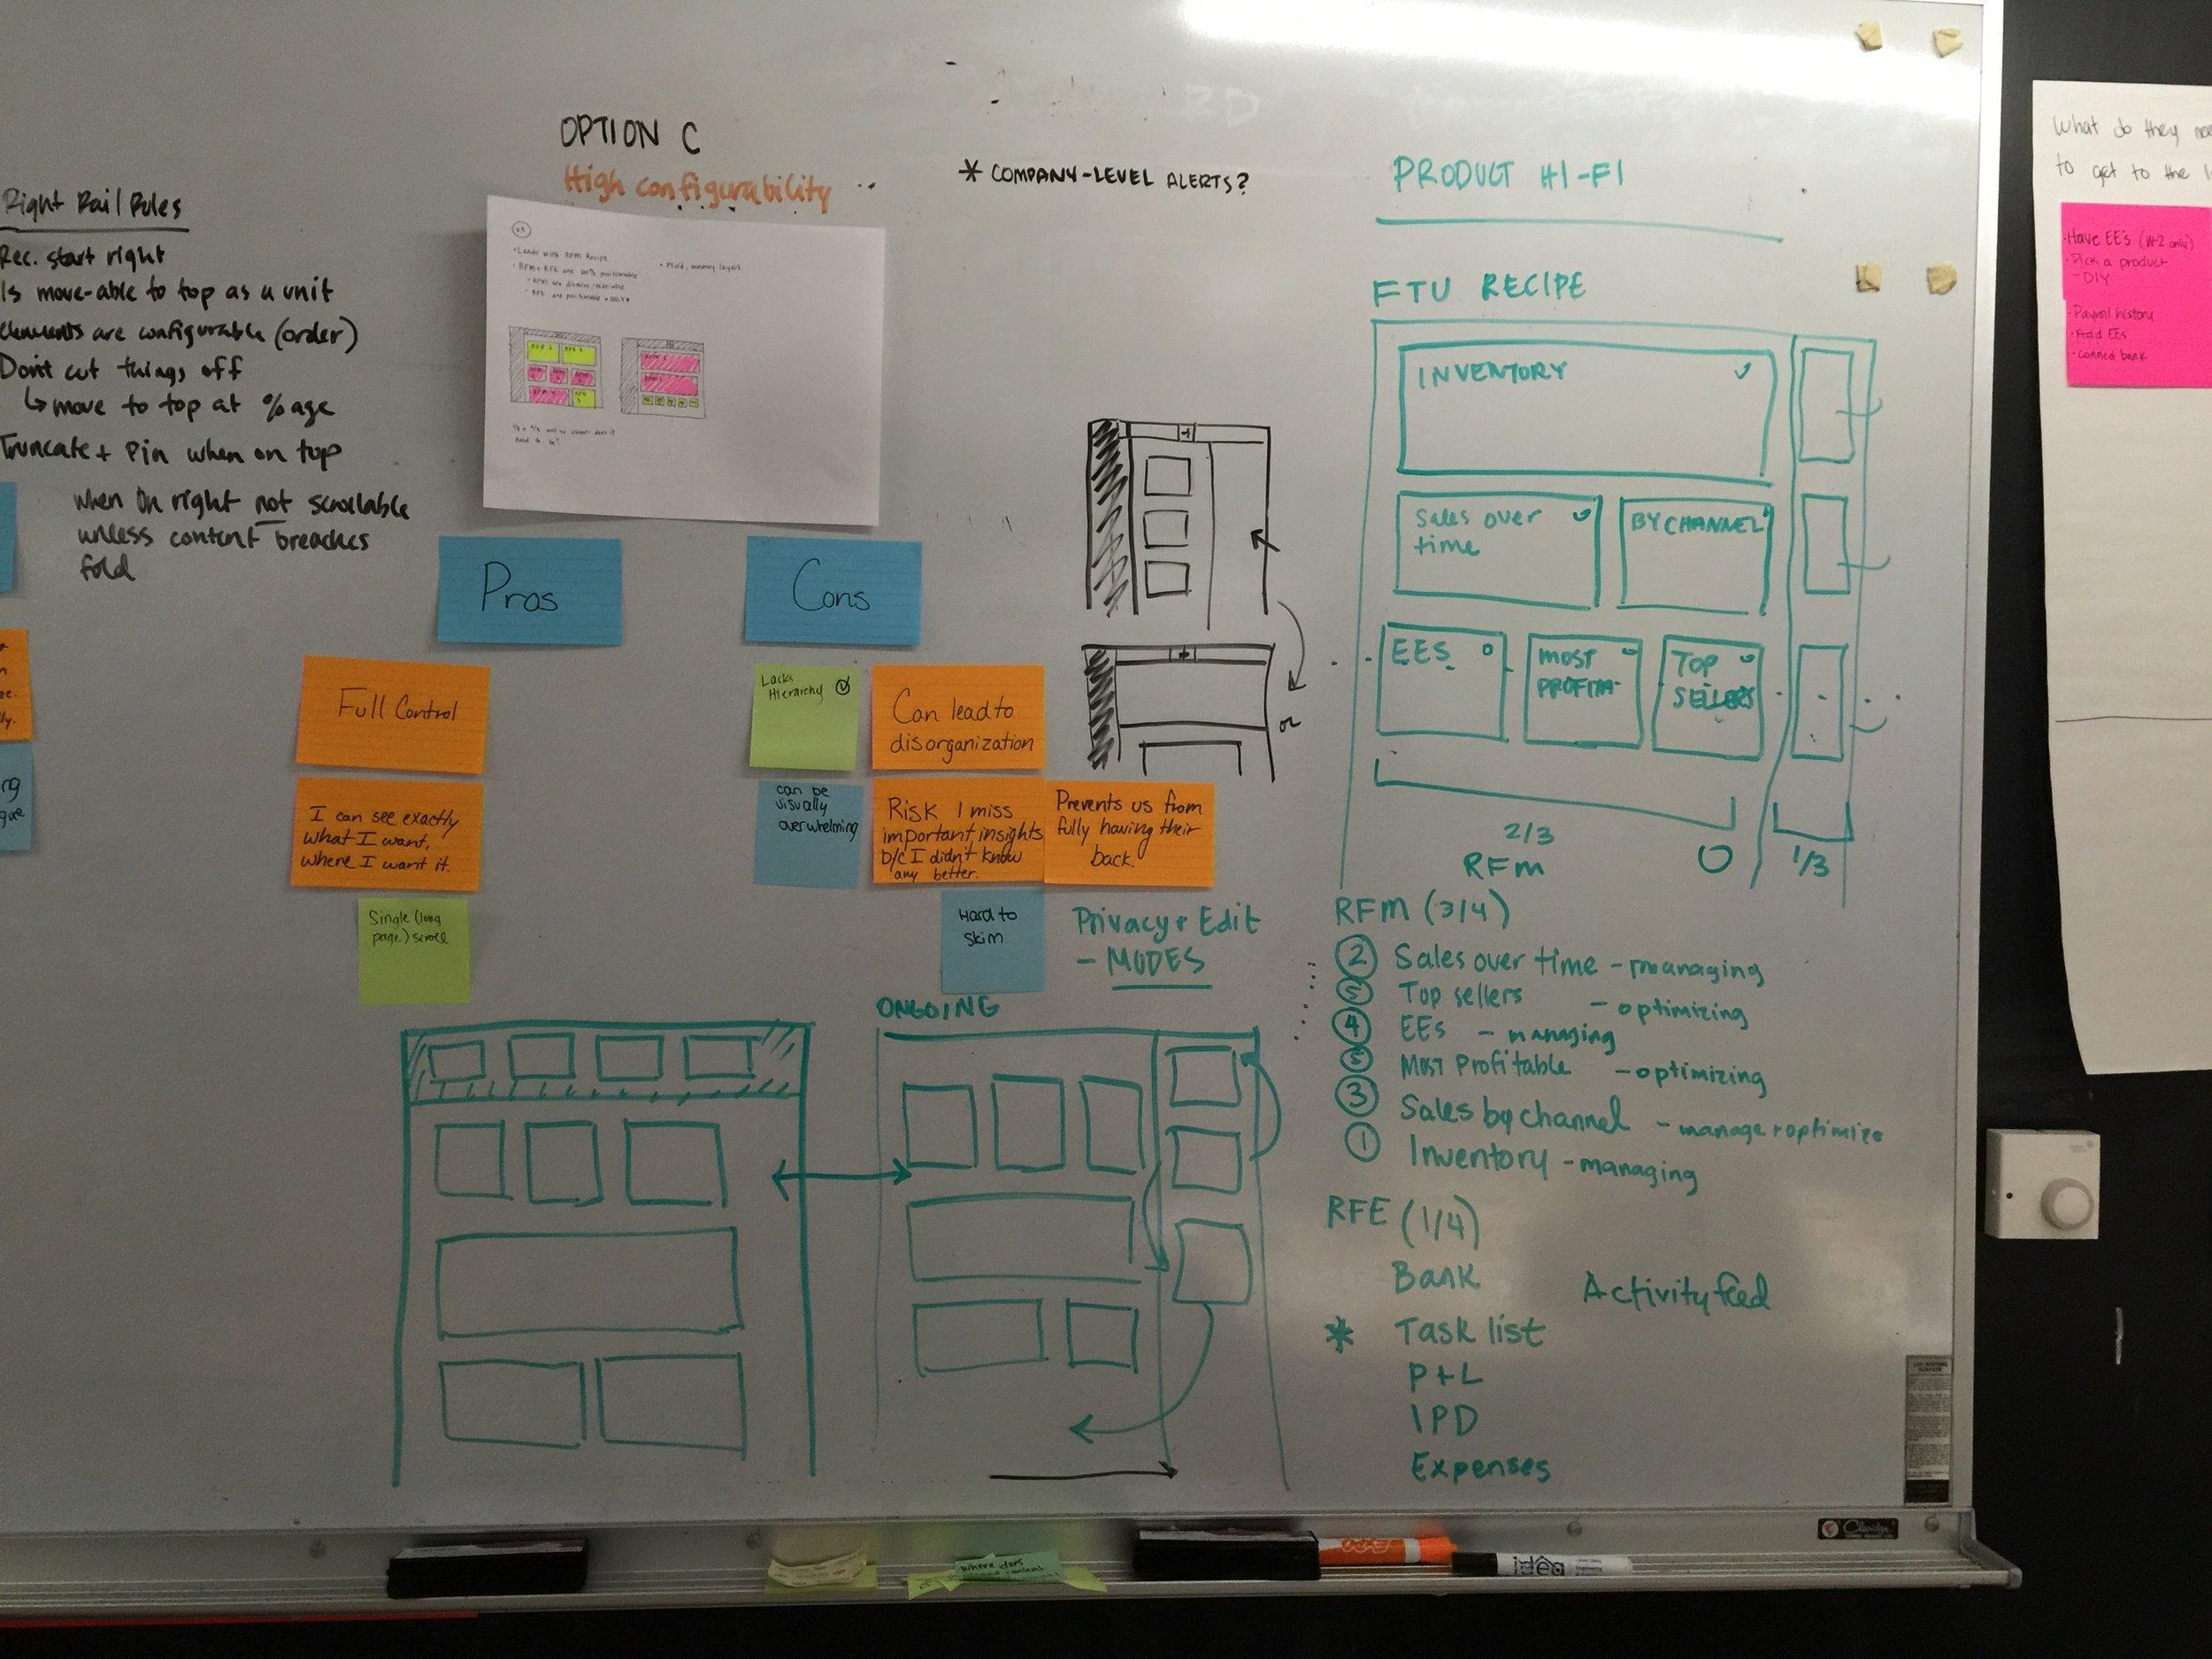 whiteboard_HiFiSketch.JPG